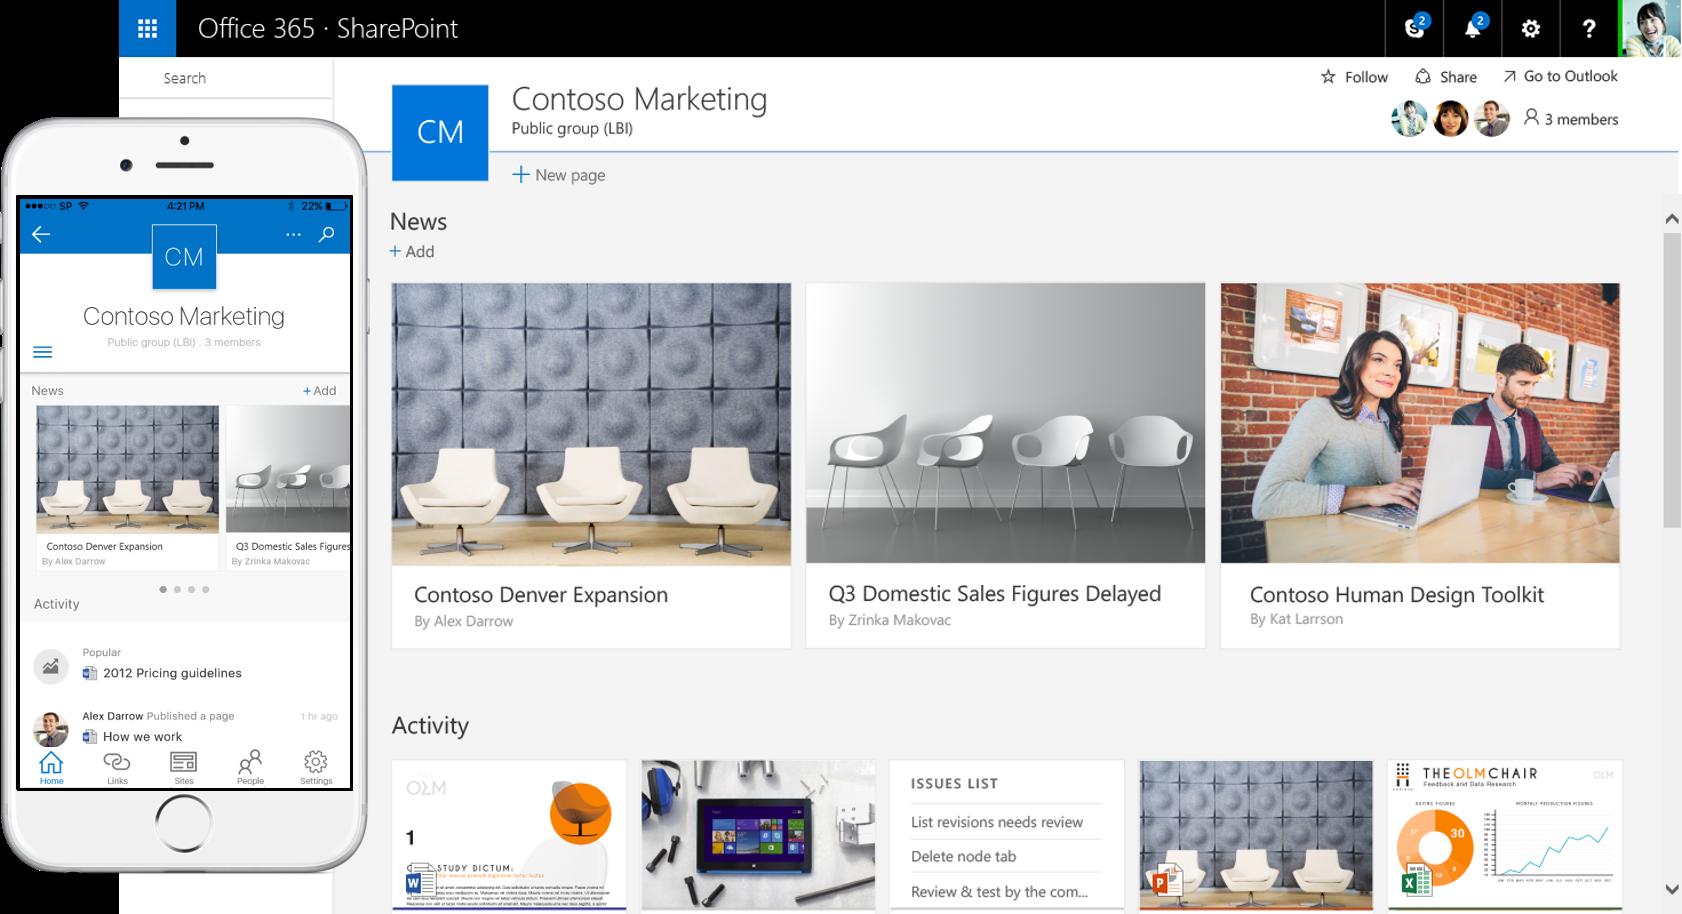 The Future of SharePoint - Microsoft 365 Blog